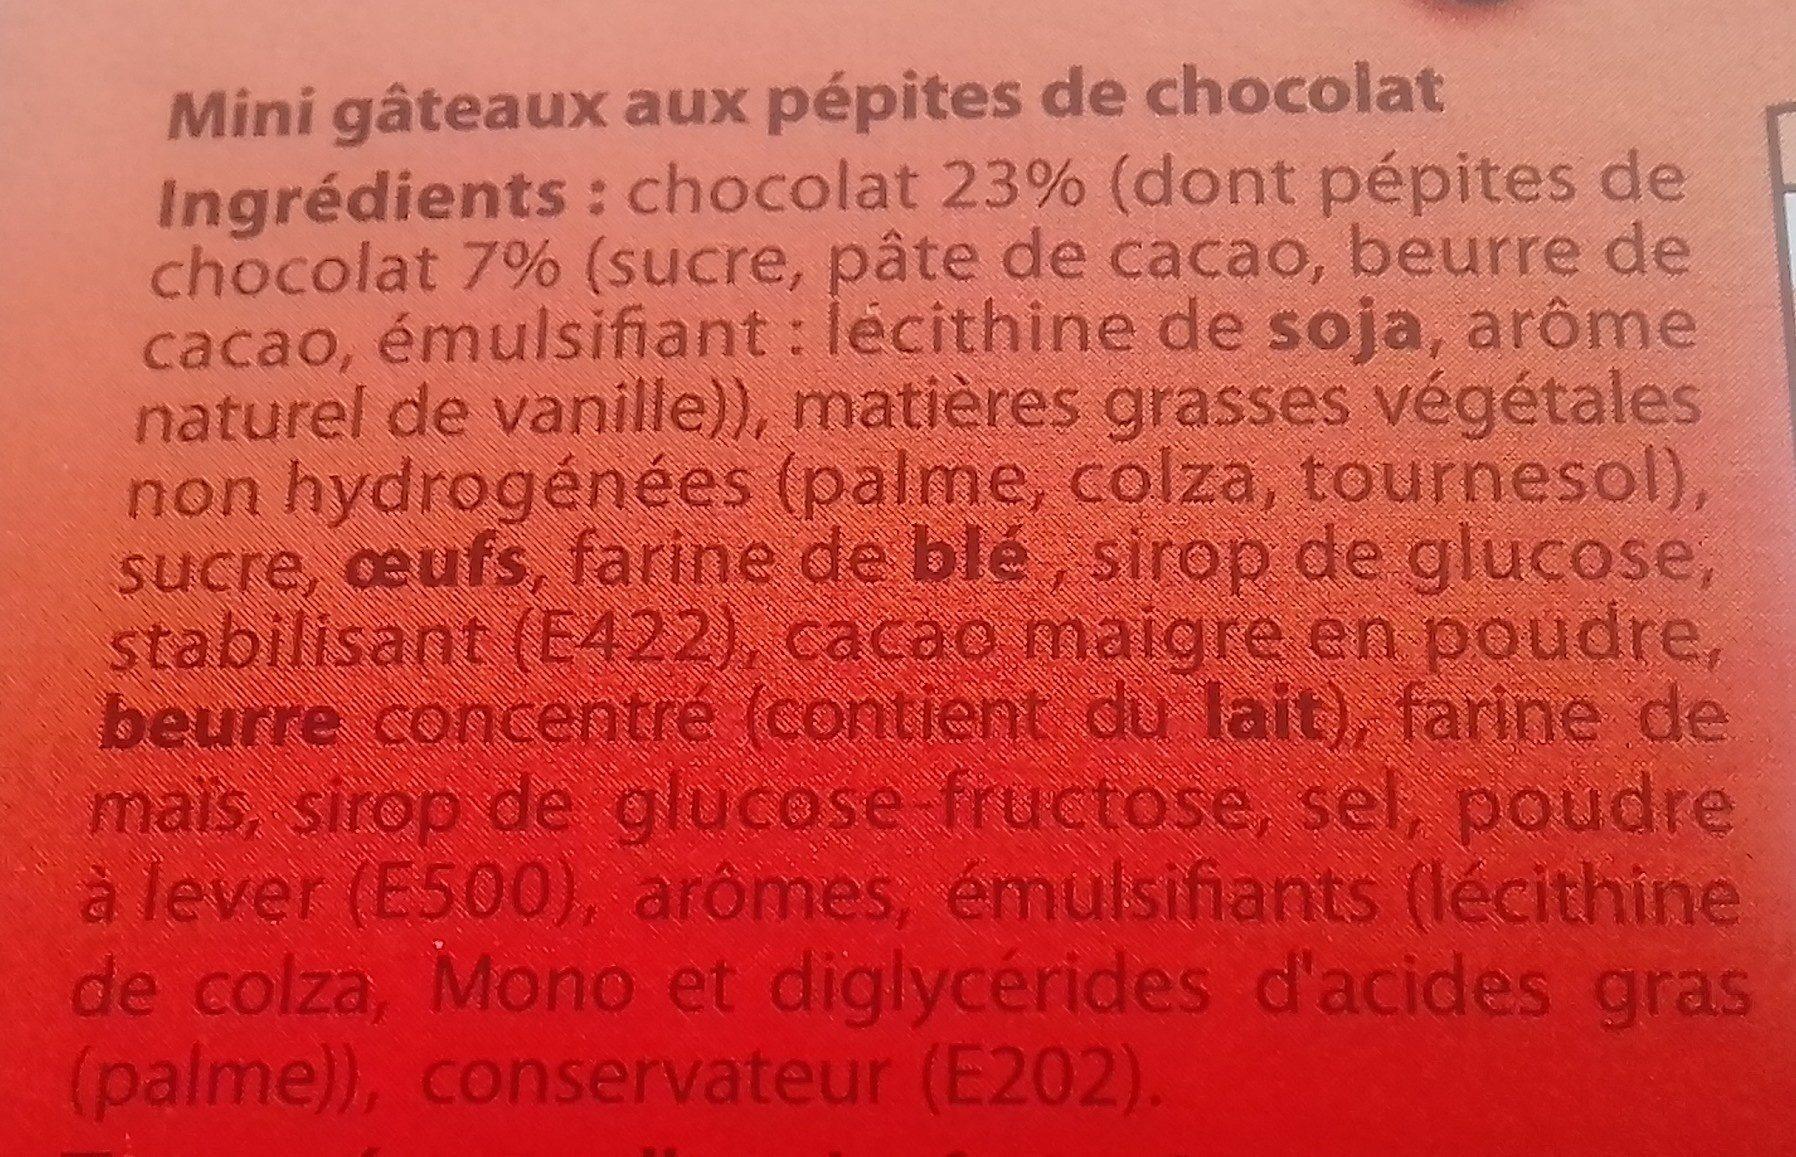 mini Brownie aux pepites de chocolat - Ingredients - fr